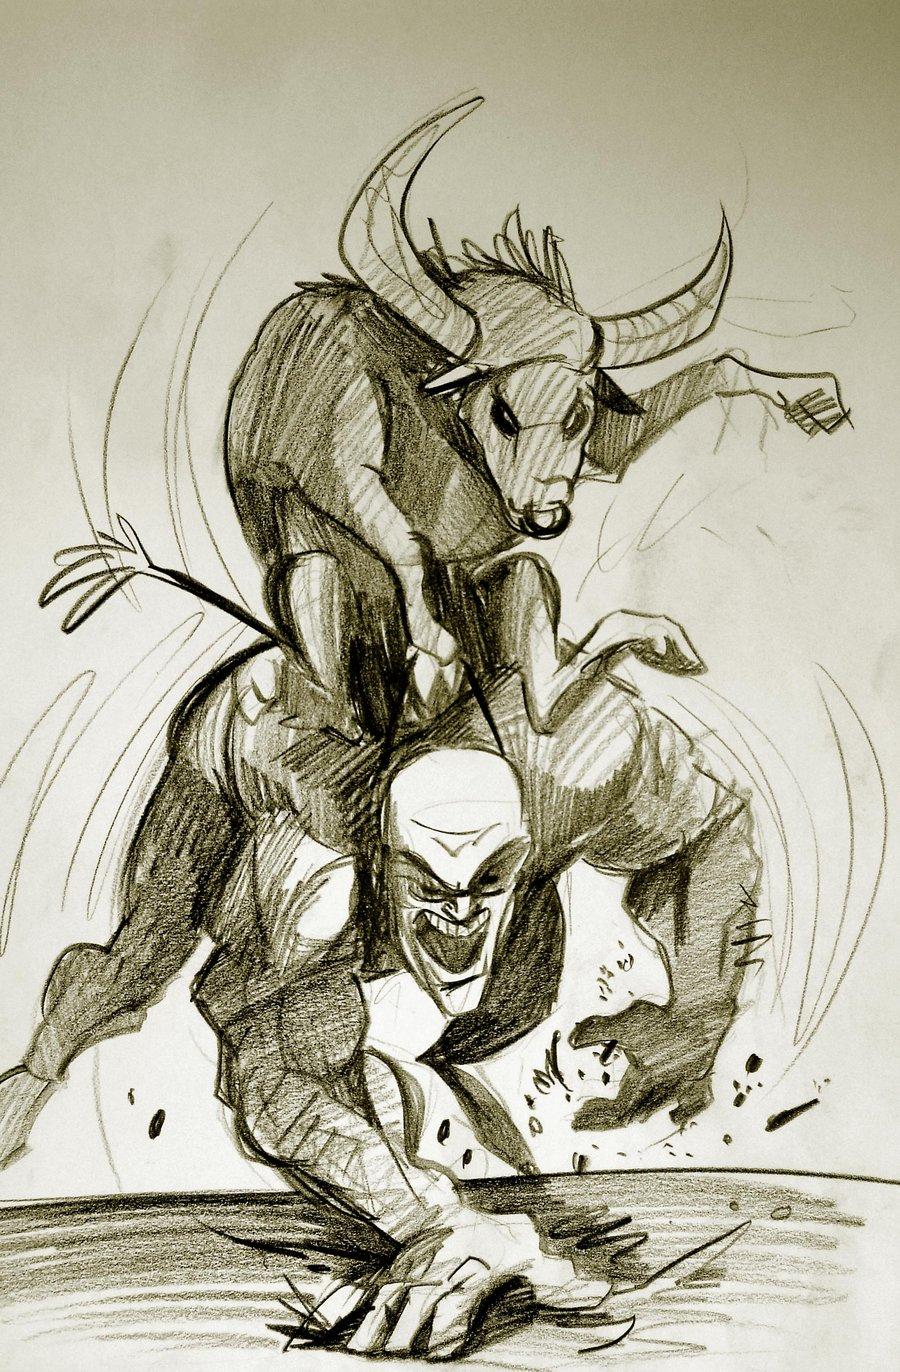 900x1372 Bull Riding Drawings Bull Riding Manheckthor